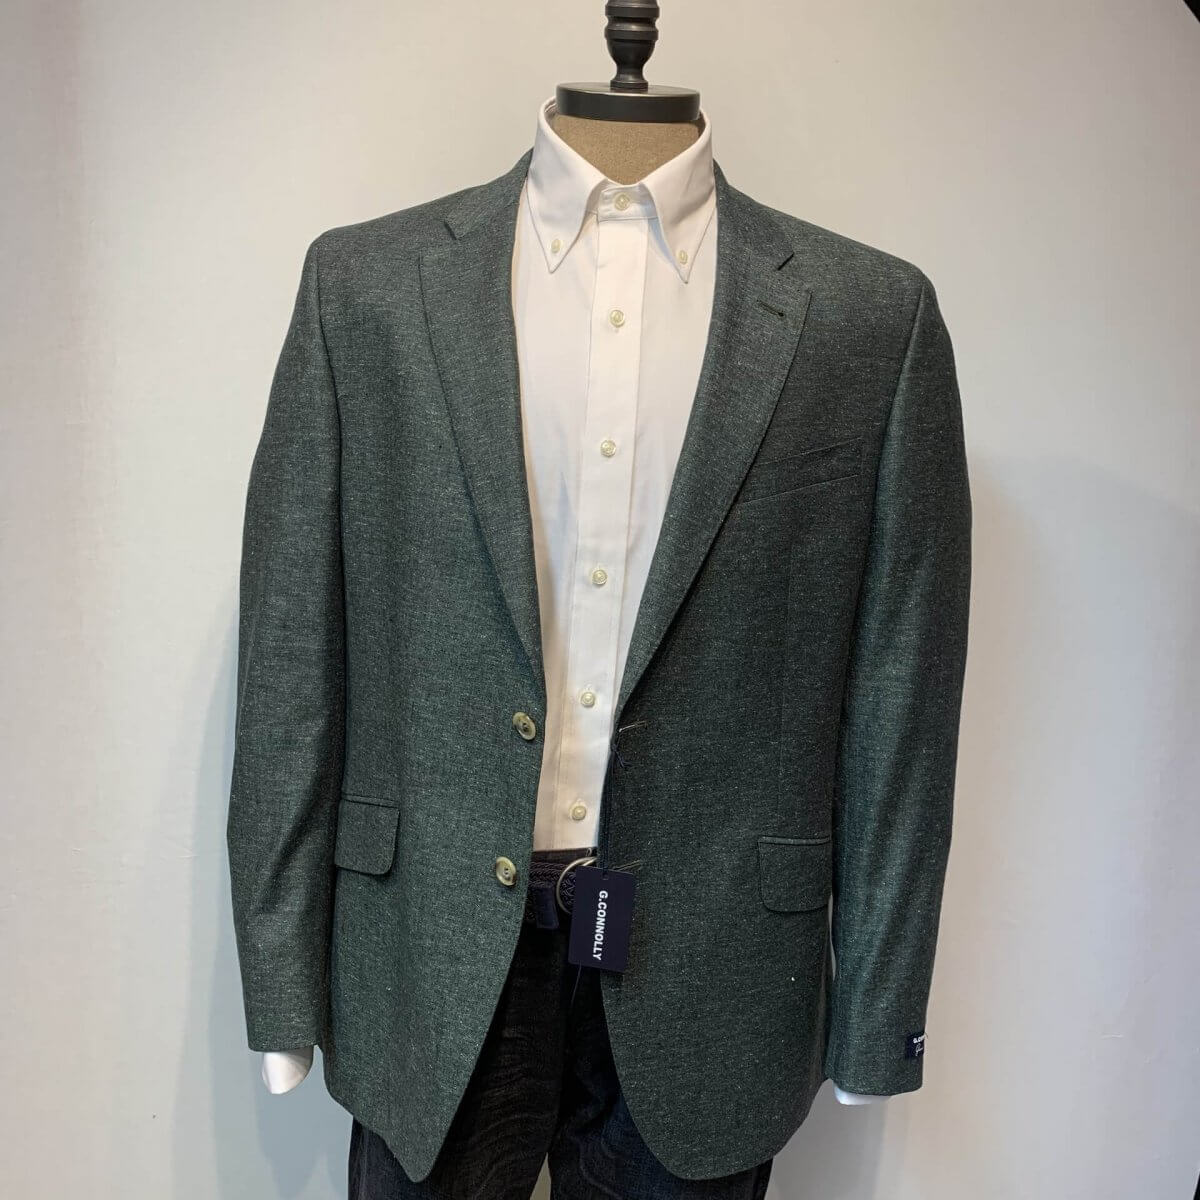 G. Connolly Blazer in Green